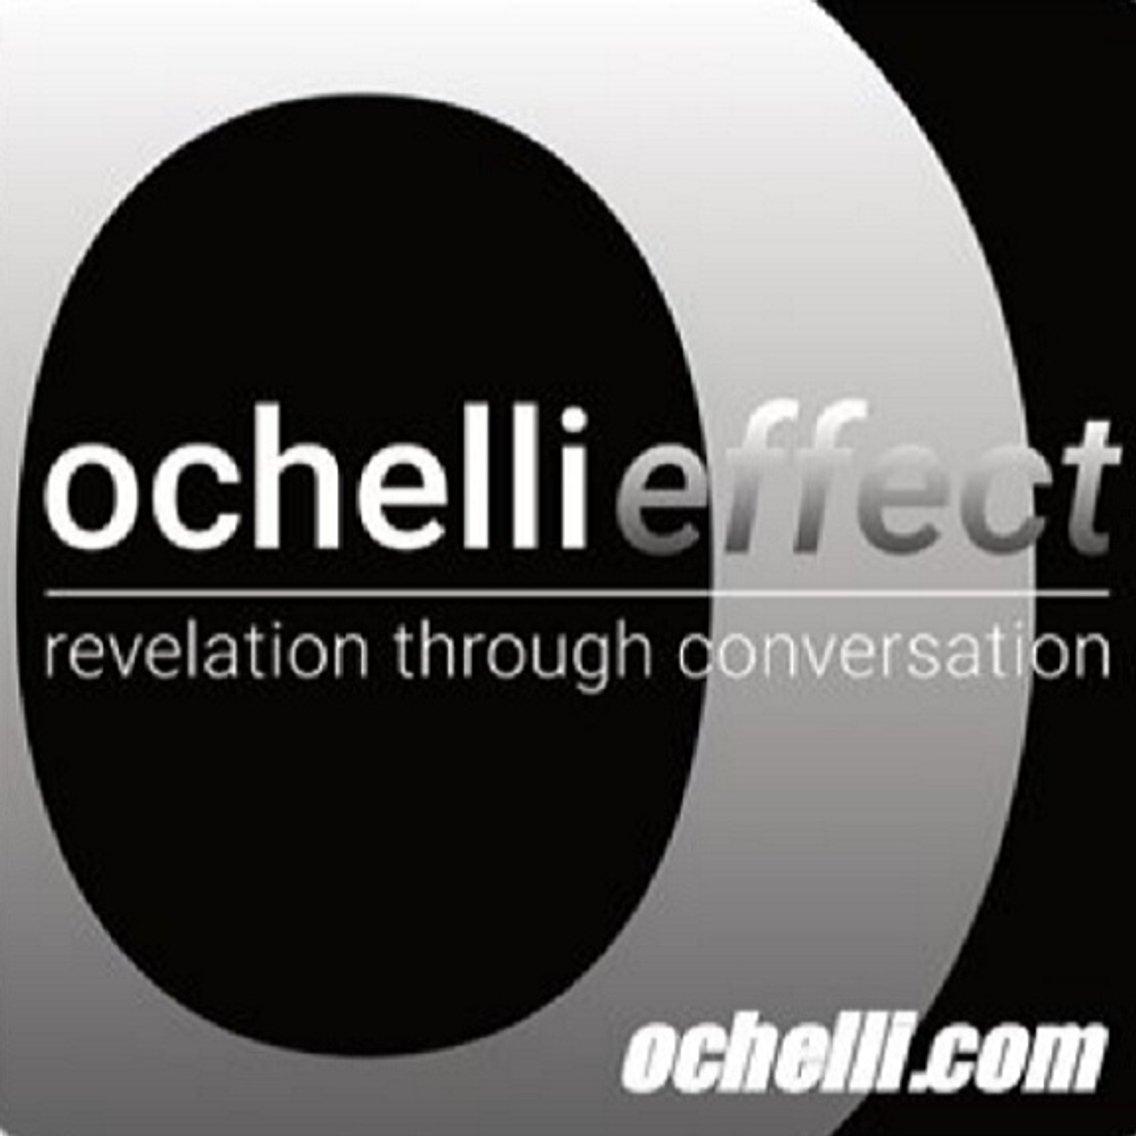 The Ochelli Effect - Cover Image